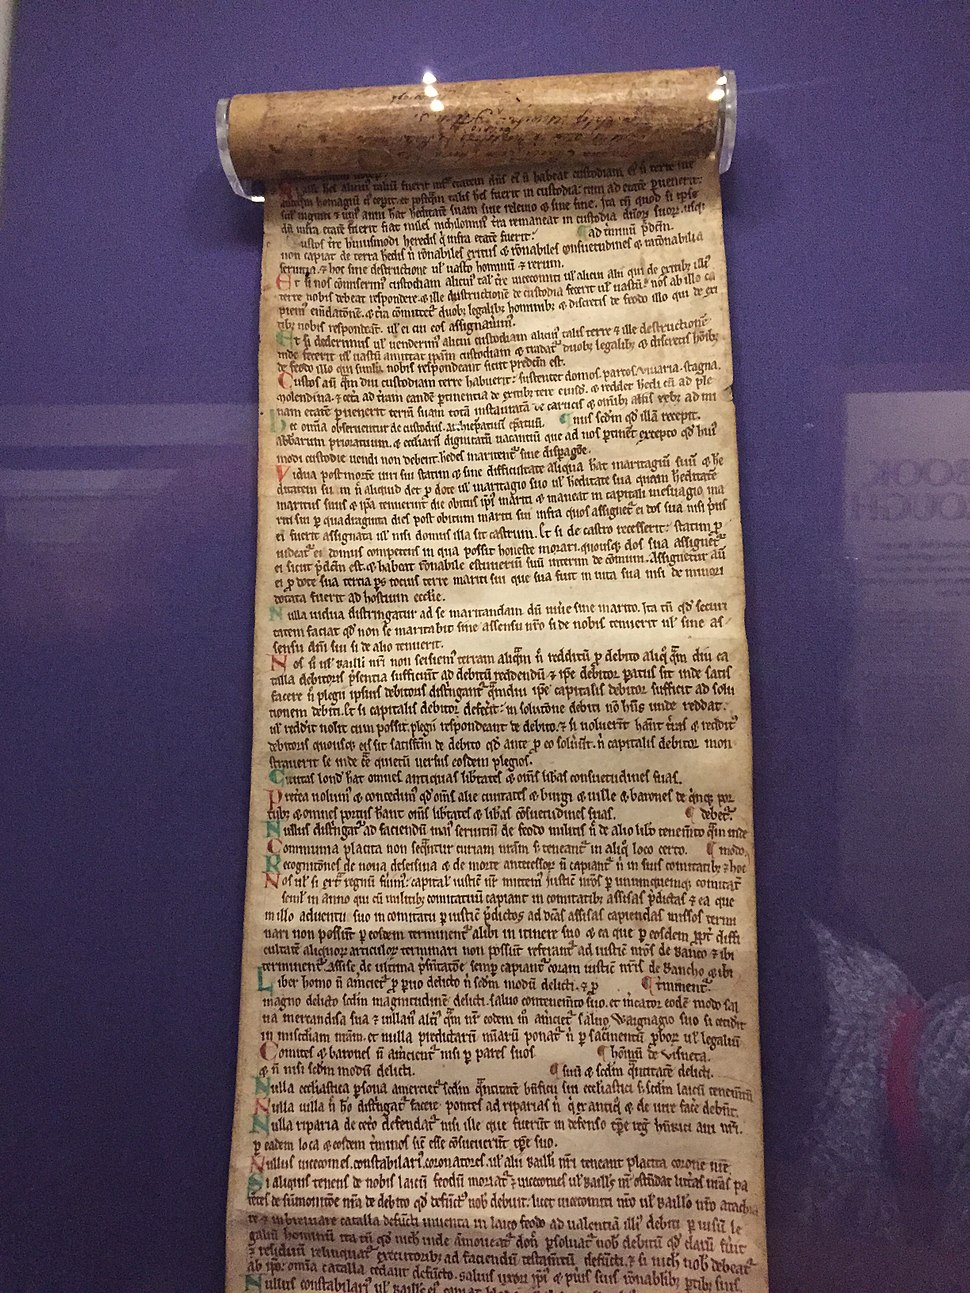 Halesowen Abbey Scroll (Magna Carta), Society of Antiquaries of London, UK - 20150617-02